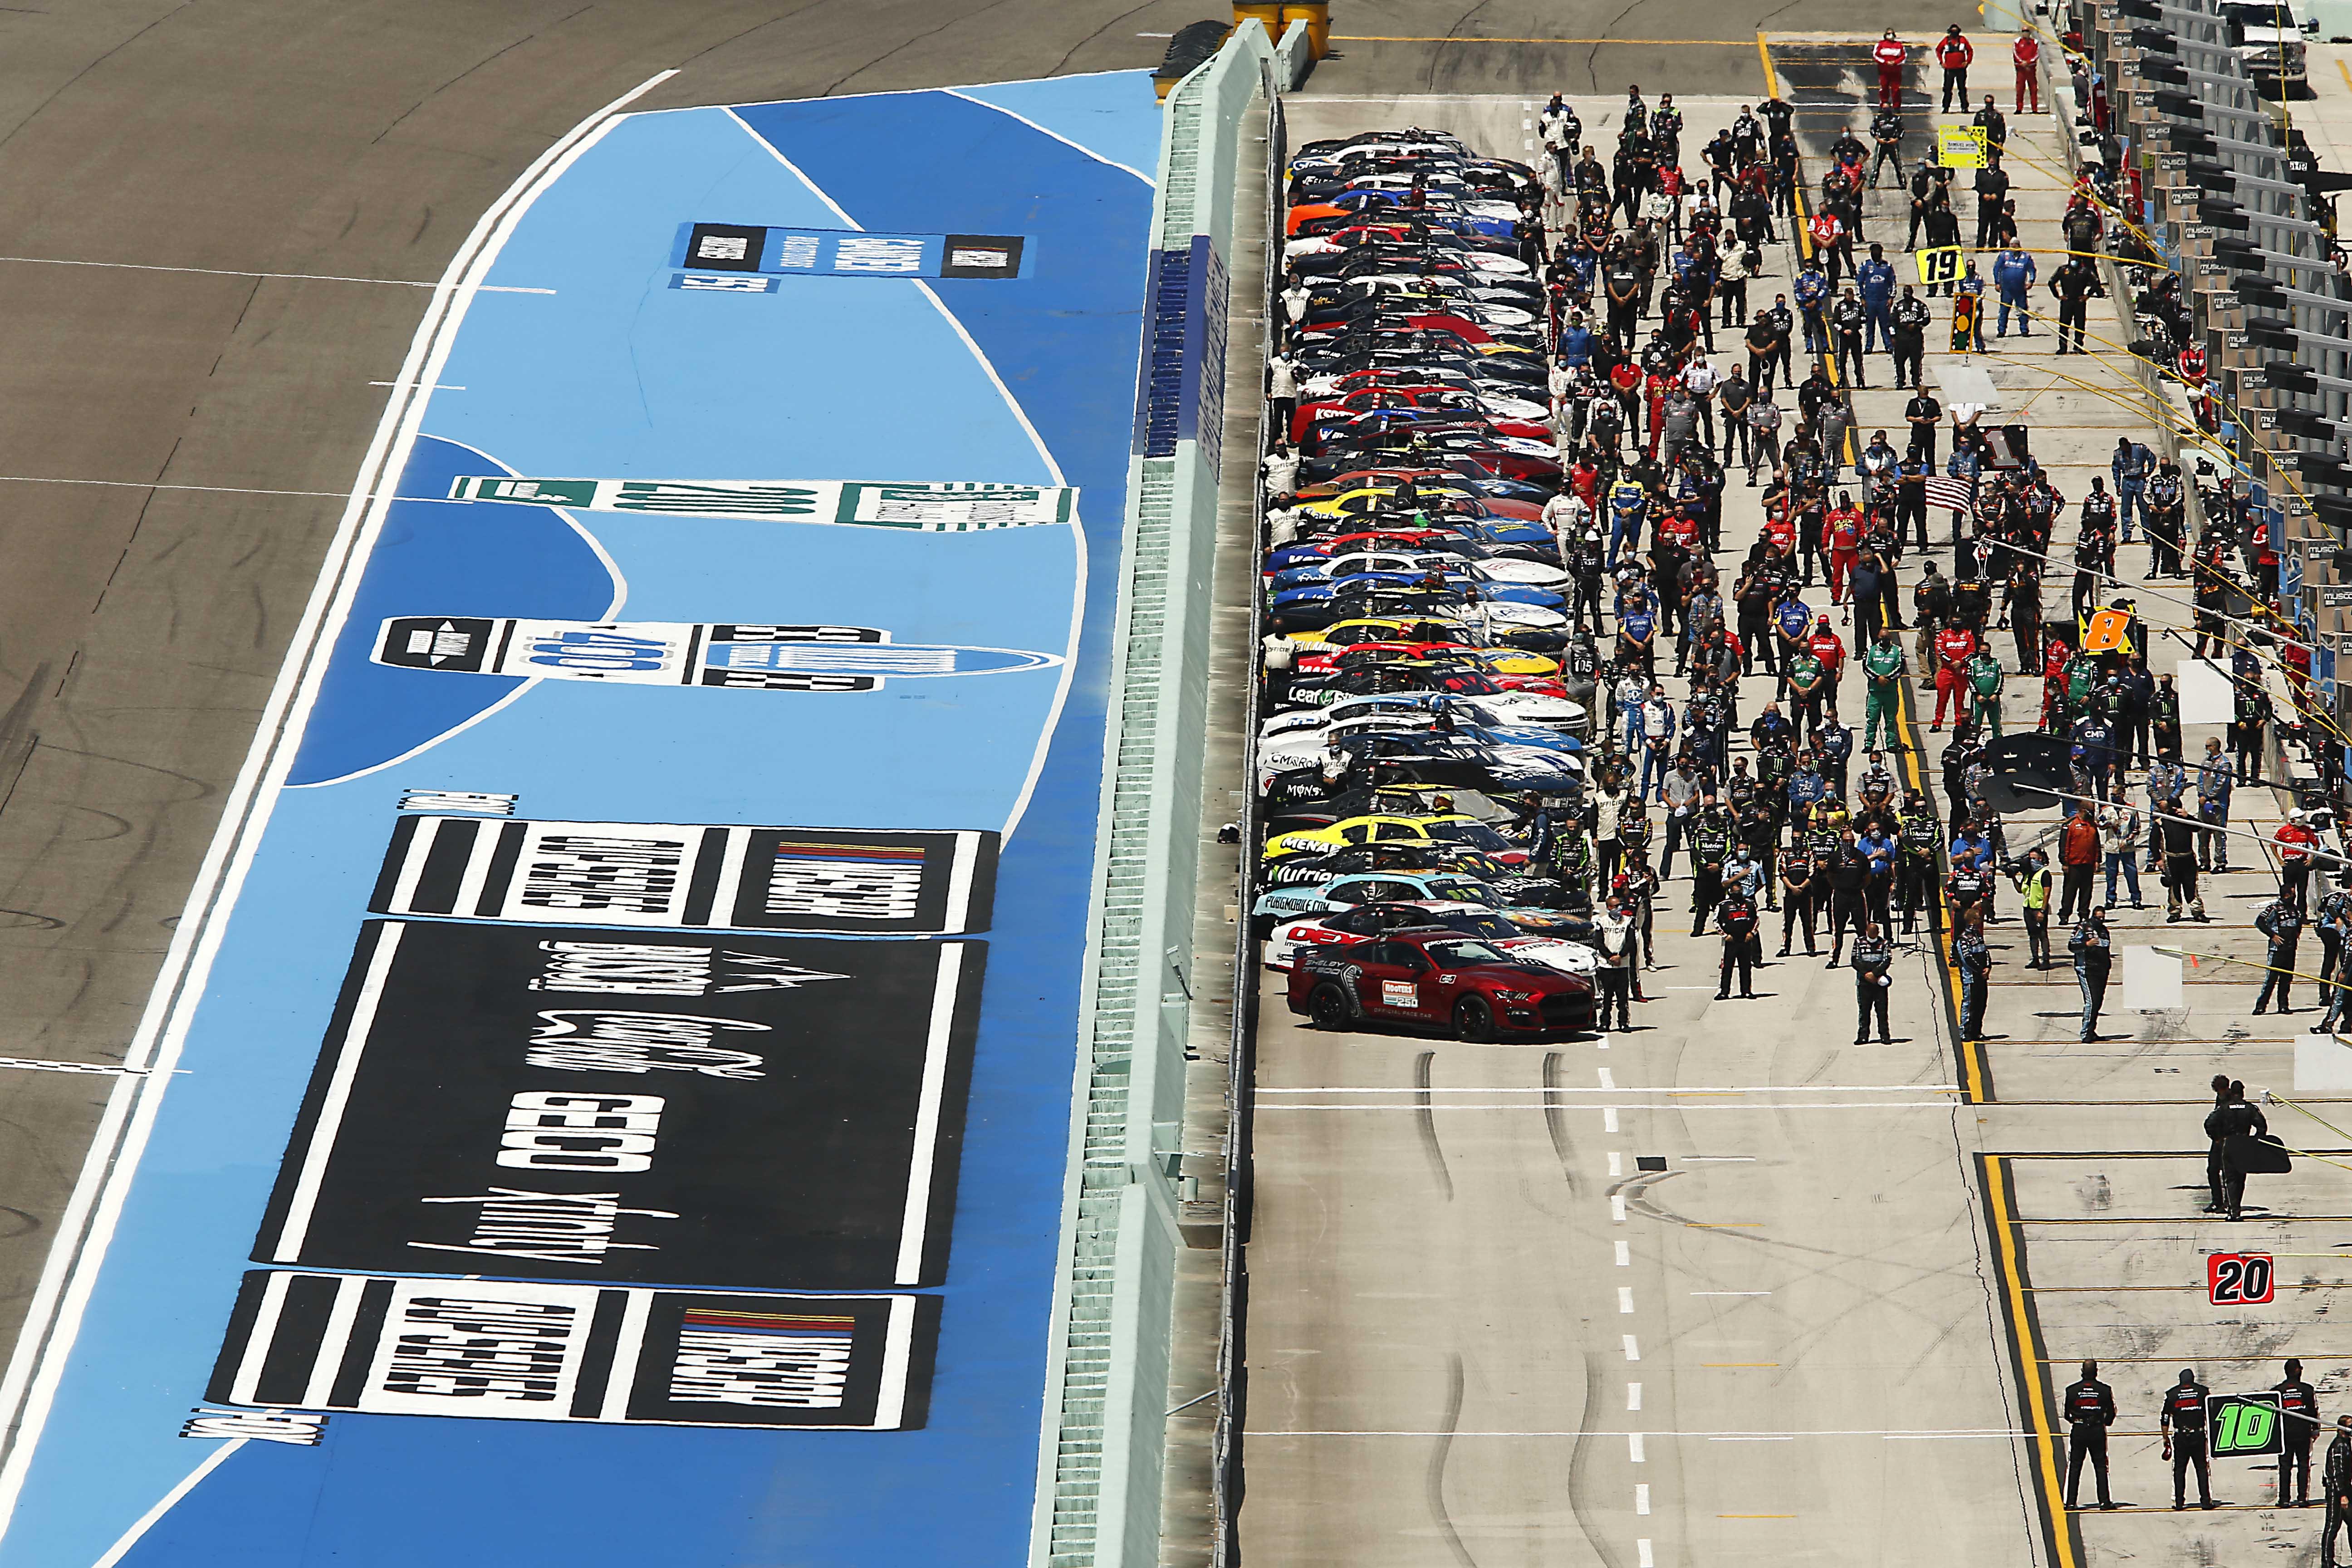 NASCAR Xfinity Series grid at Homestead-Miami Speedway